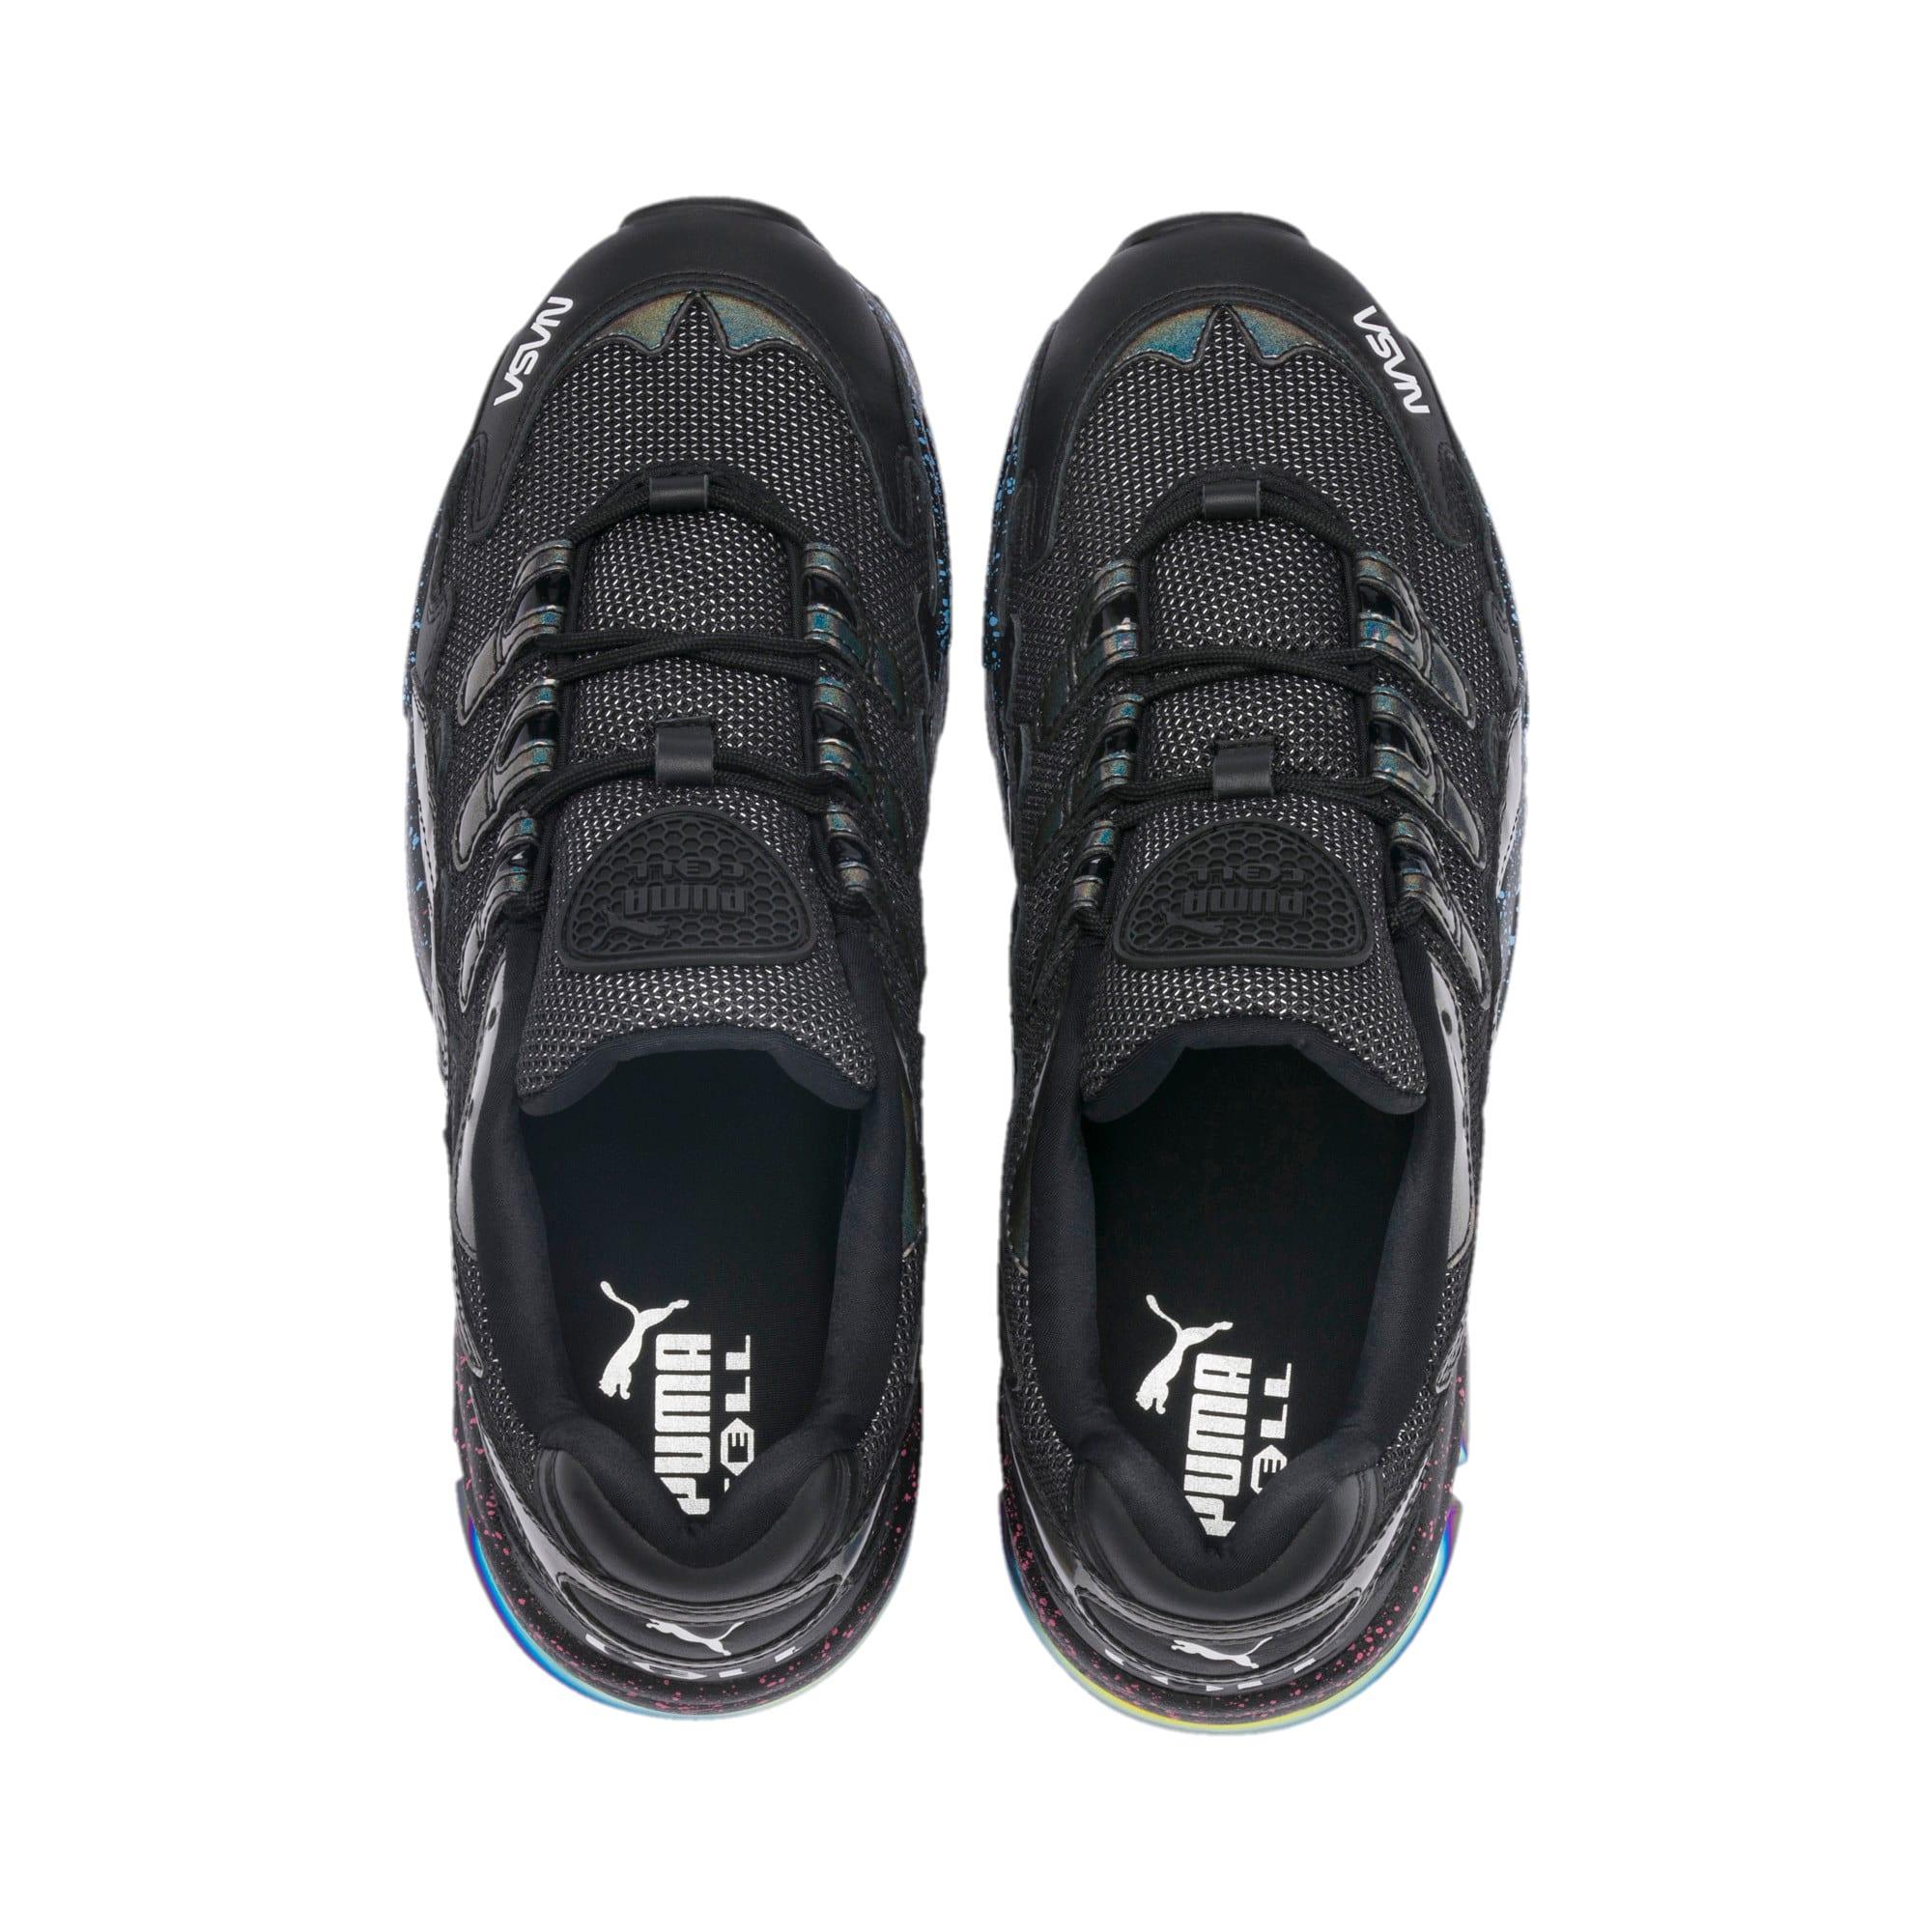 Thumbnail 6 of CELL Alien X Space Agency Sneakers, Puma Black-Puma Black, medium